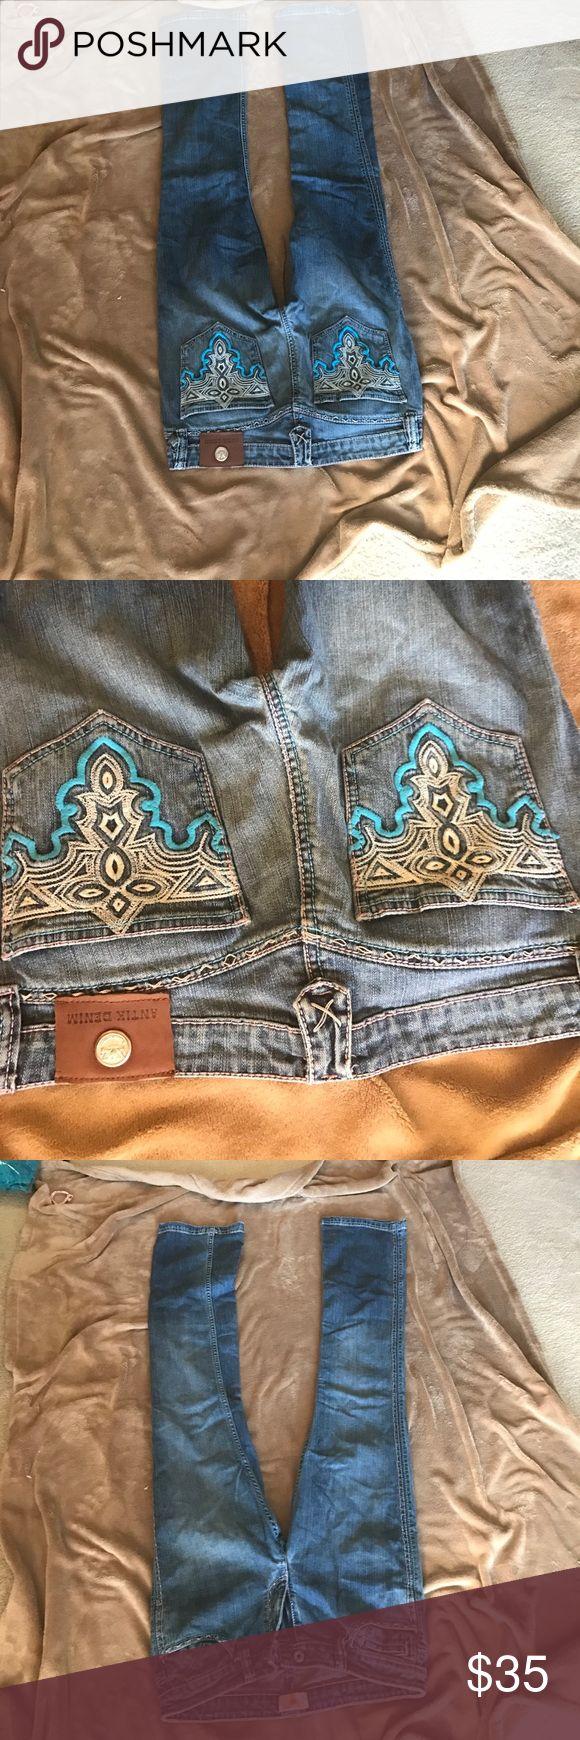 Antik Bootcut jeans 30x33 fits like a 29 like new Never worn Antik Batik Jeans Boot Cut